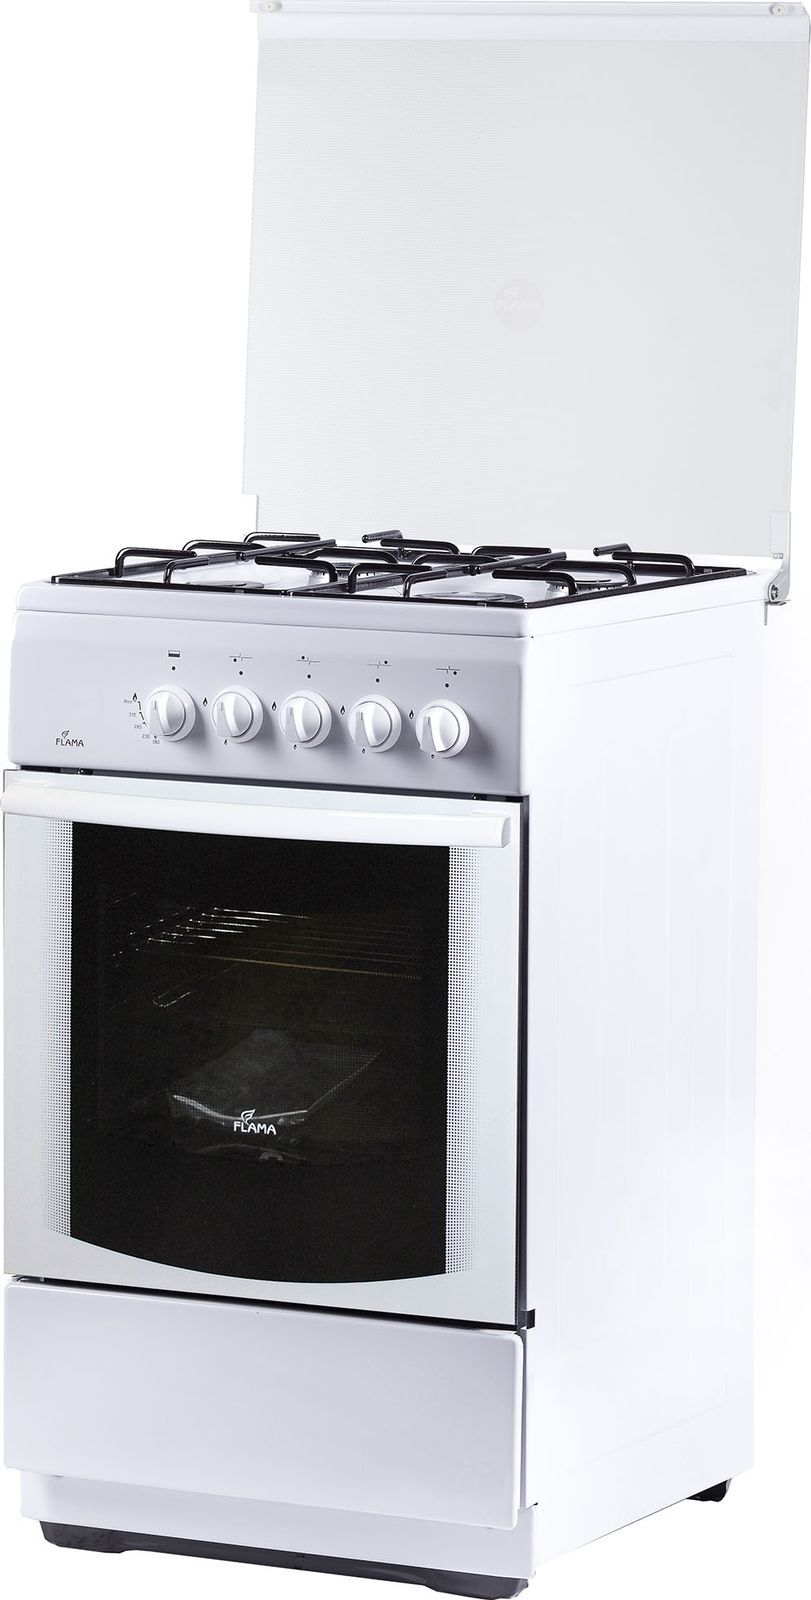 Кухонная плита Flama FG 2406 B, коричневый